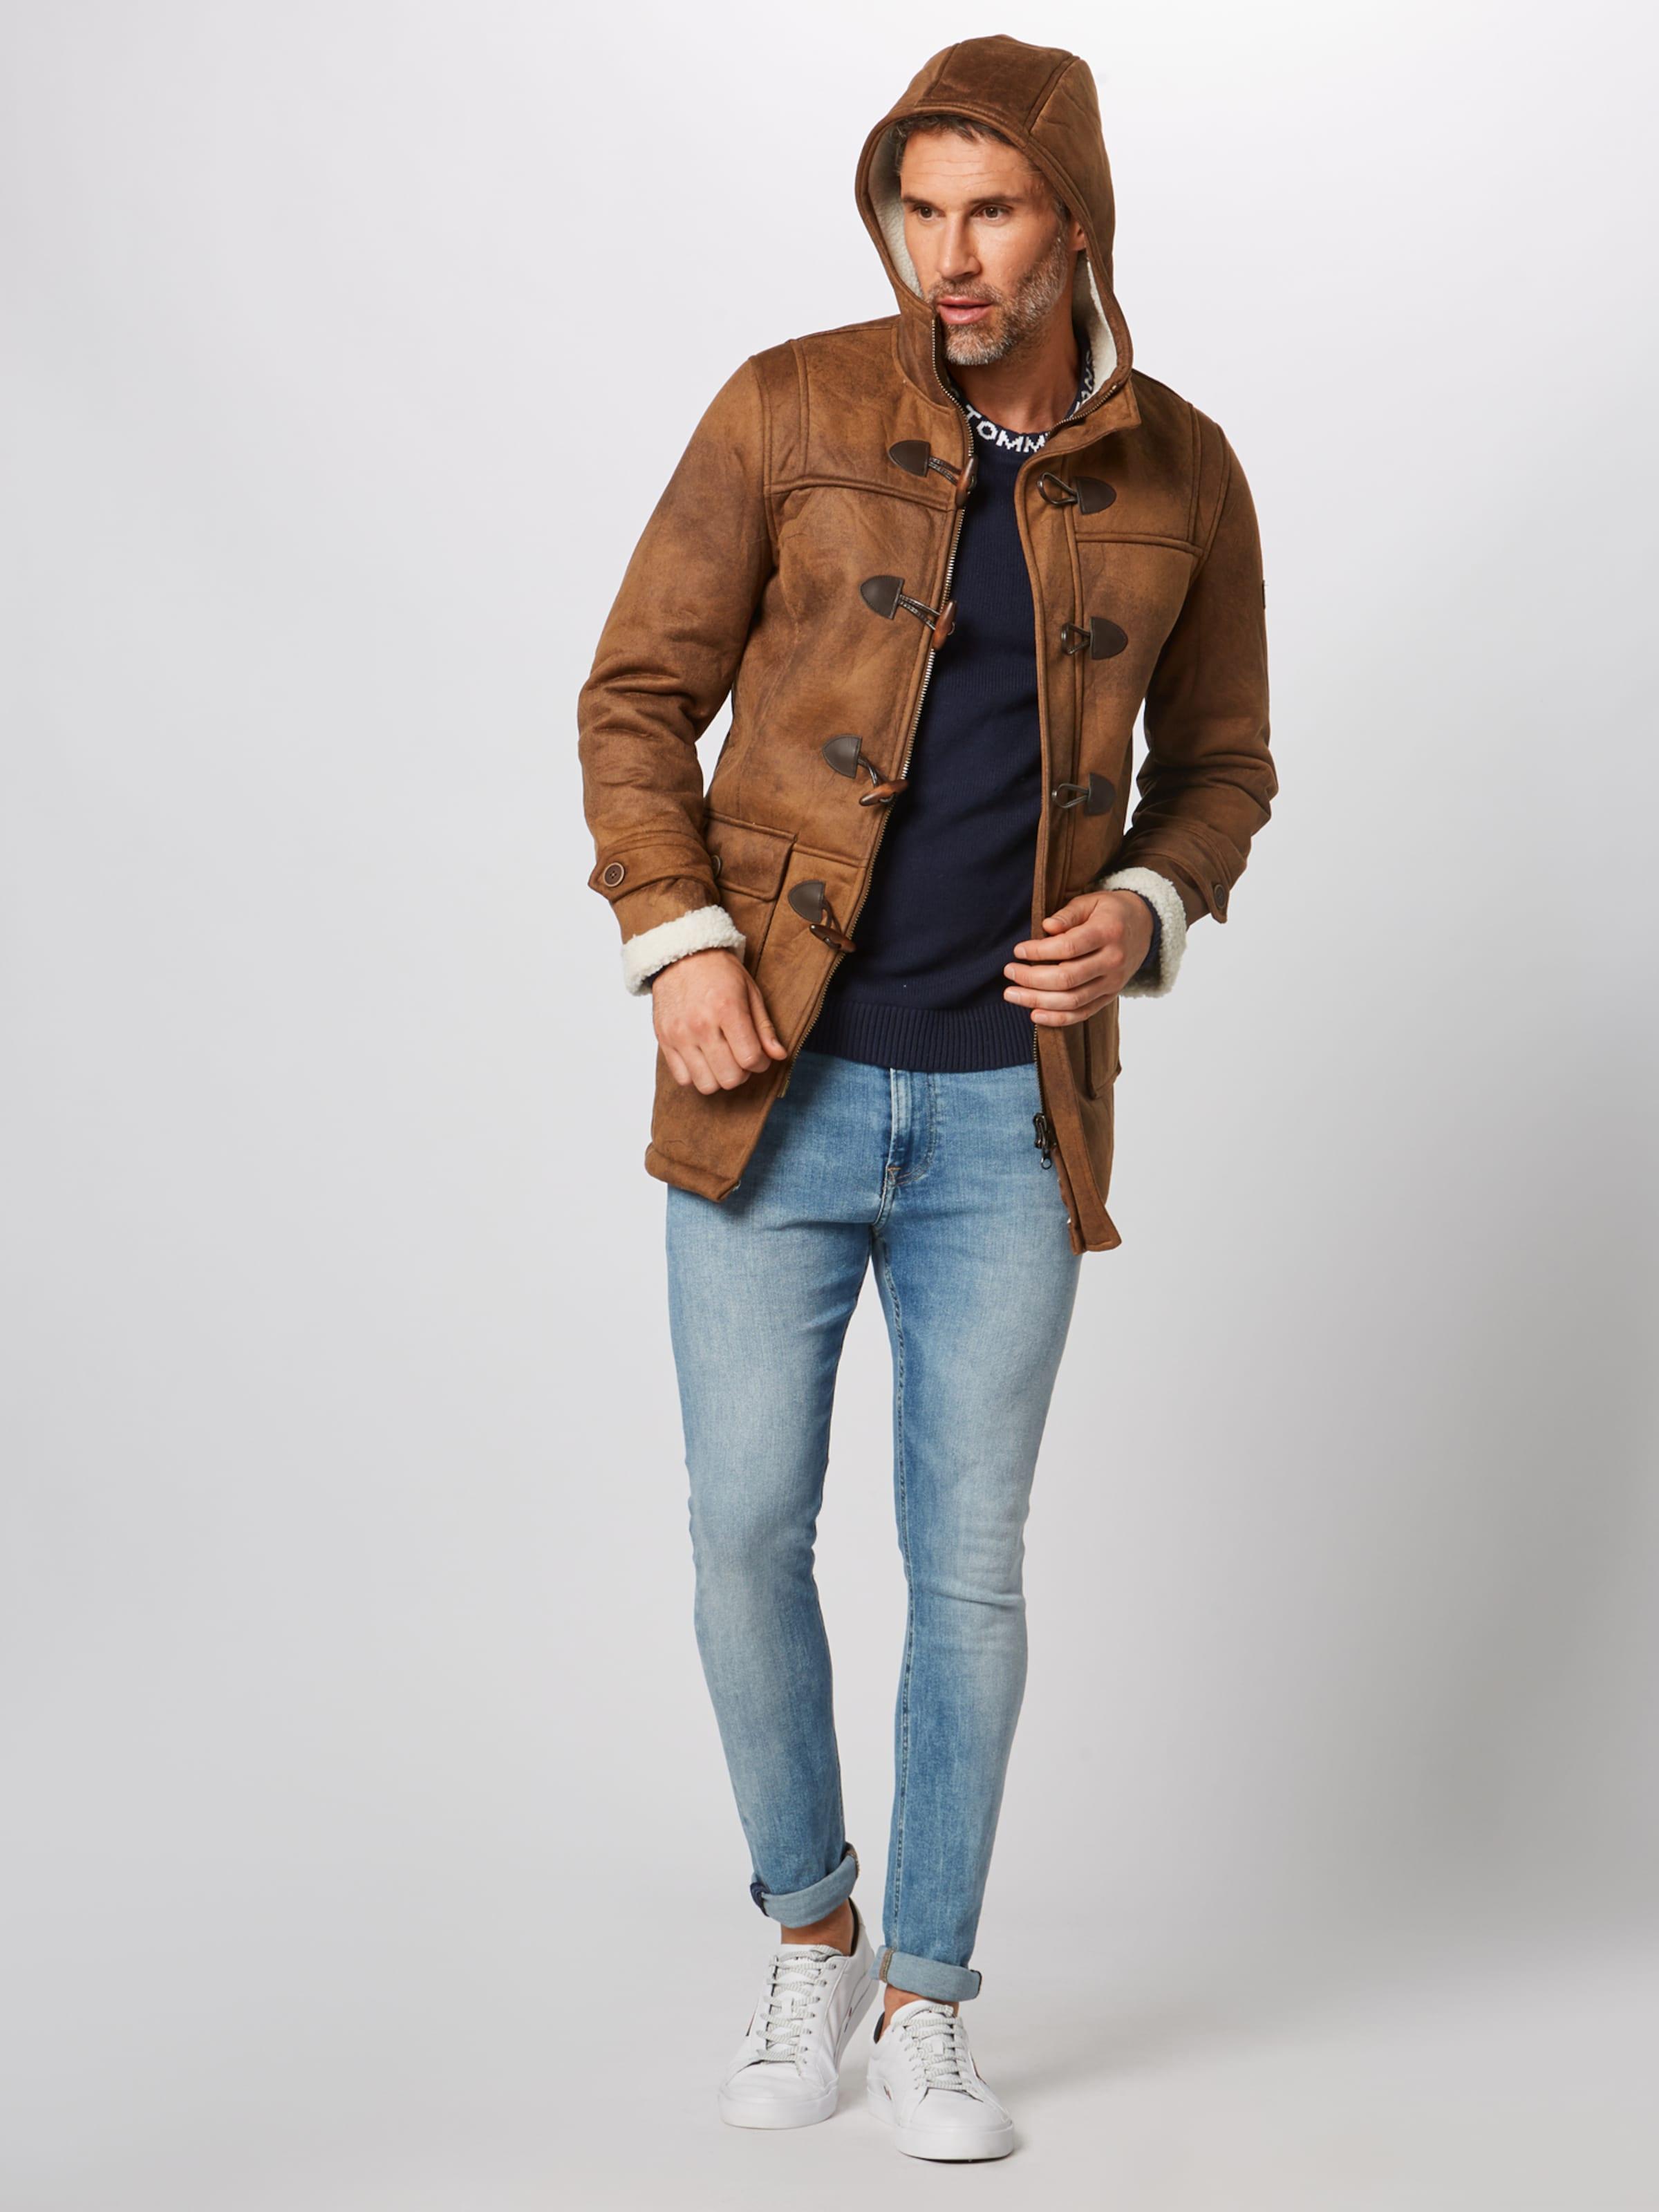 Jeans Mantel Braun Indicode Indicode In W2DEeHY9I